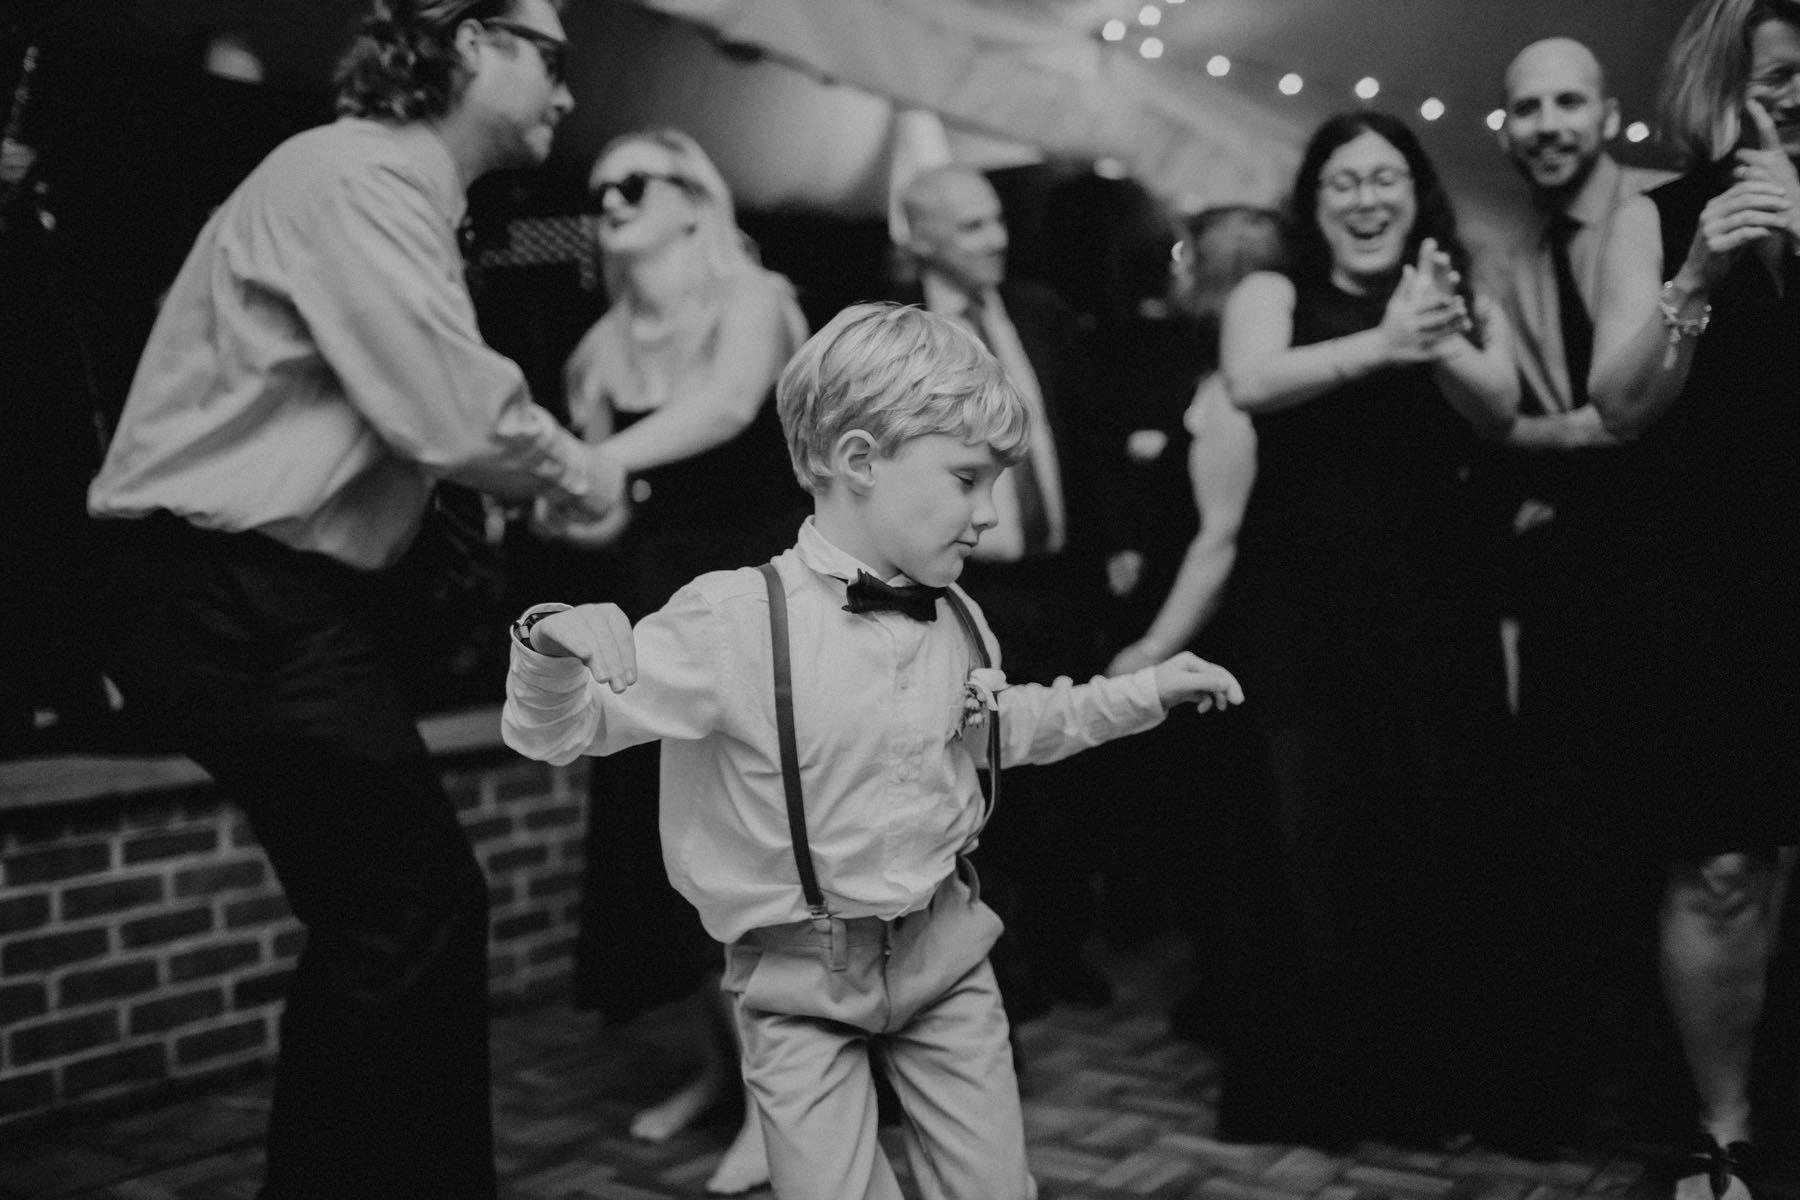 greenville-country-club-wedding-148.jpg